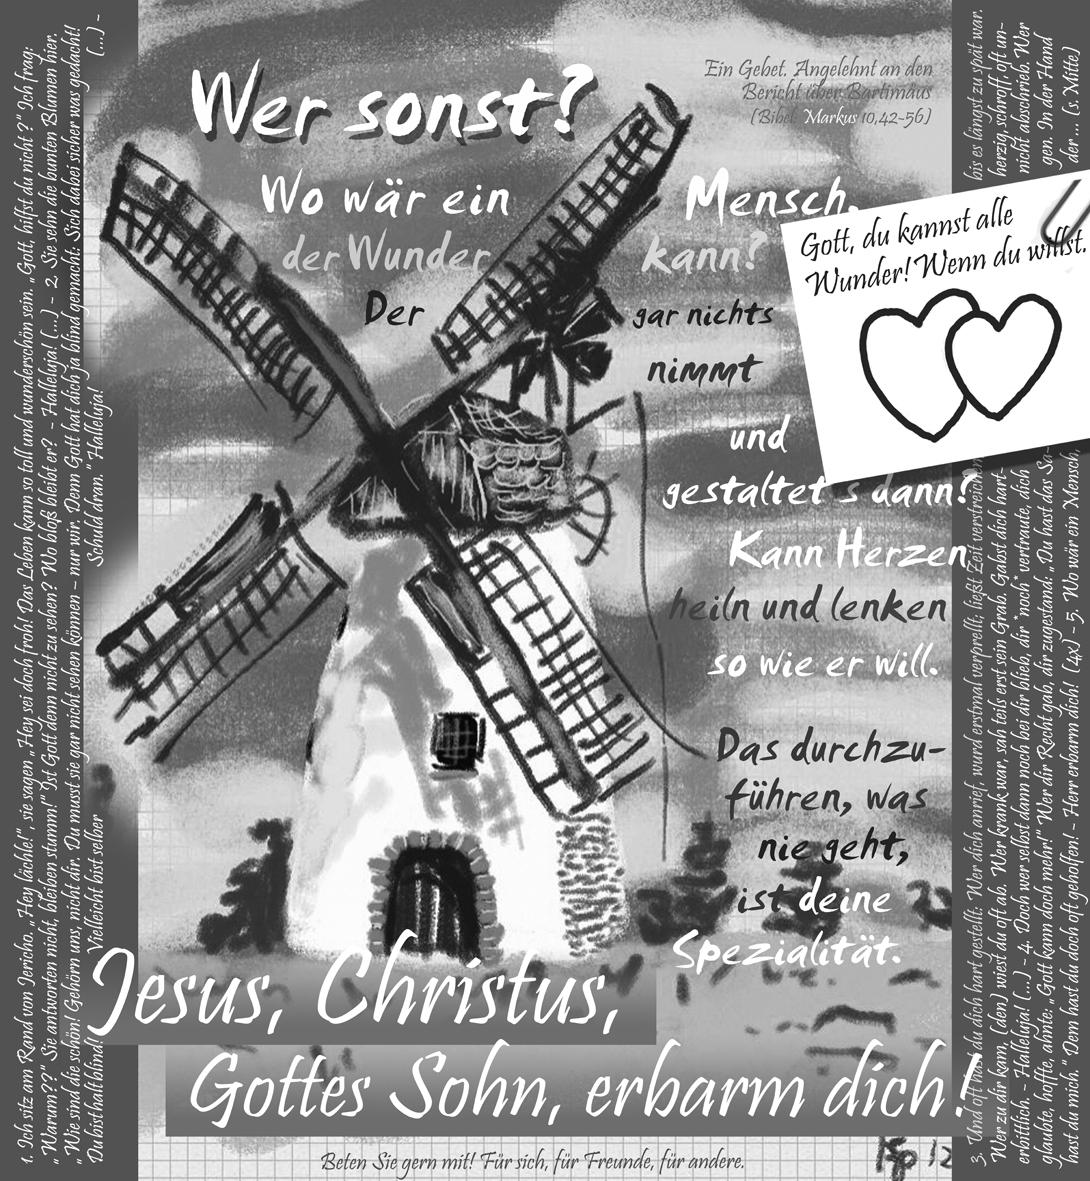 Wer-sonst-windmuehle-misch-fertig-korr271213-150dpi-kp